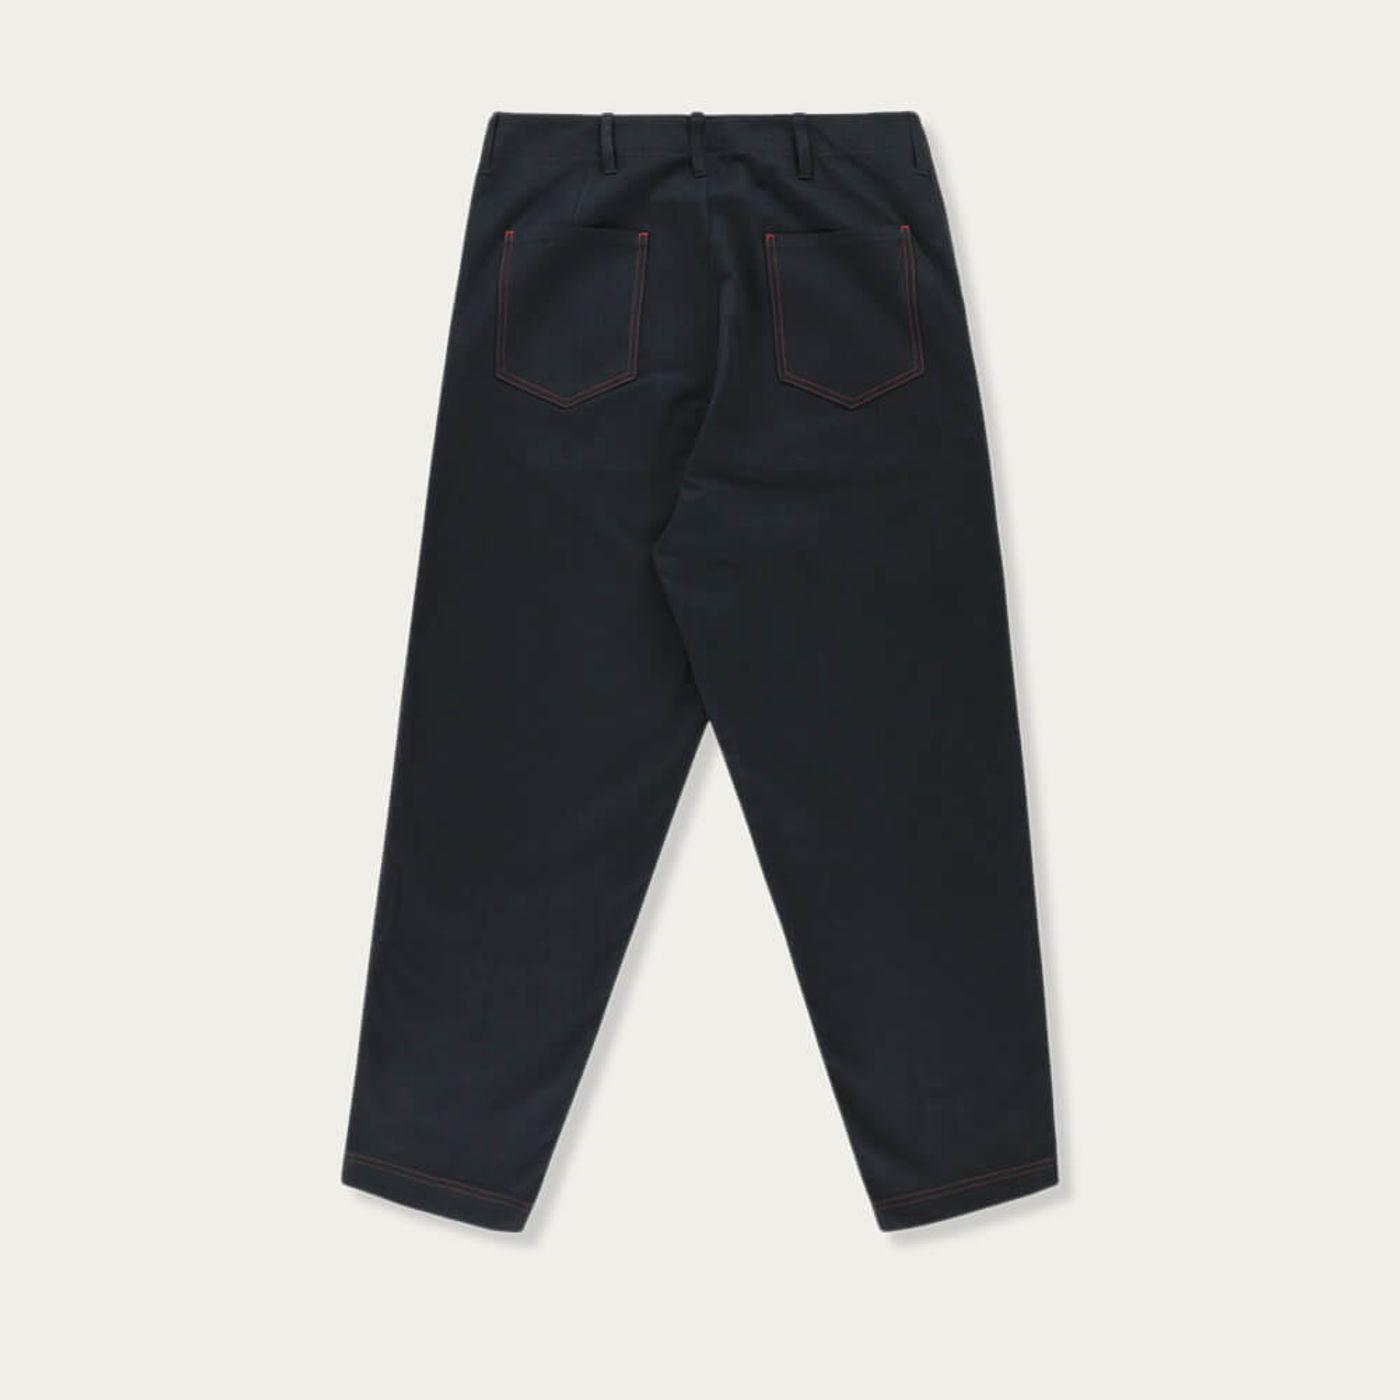 Navy Blue Hockney Tapered Pants   Bombinate